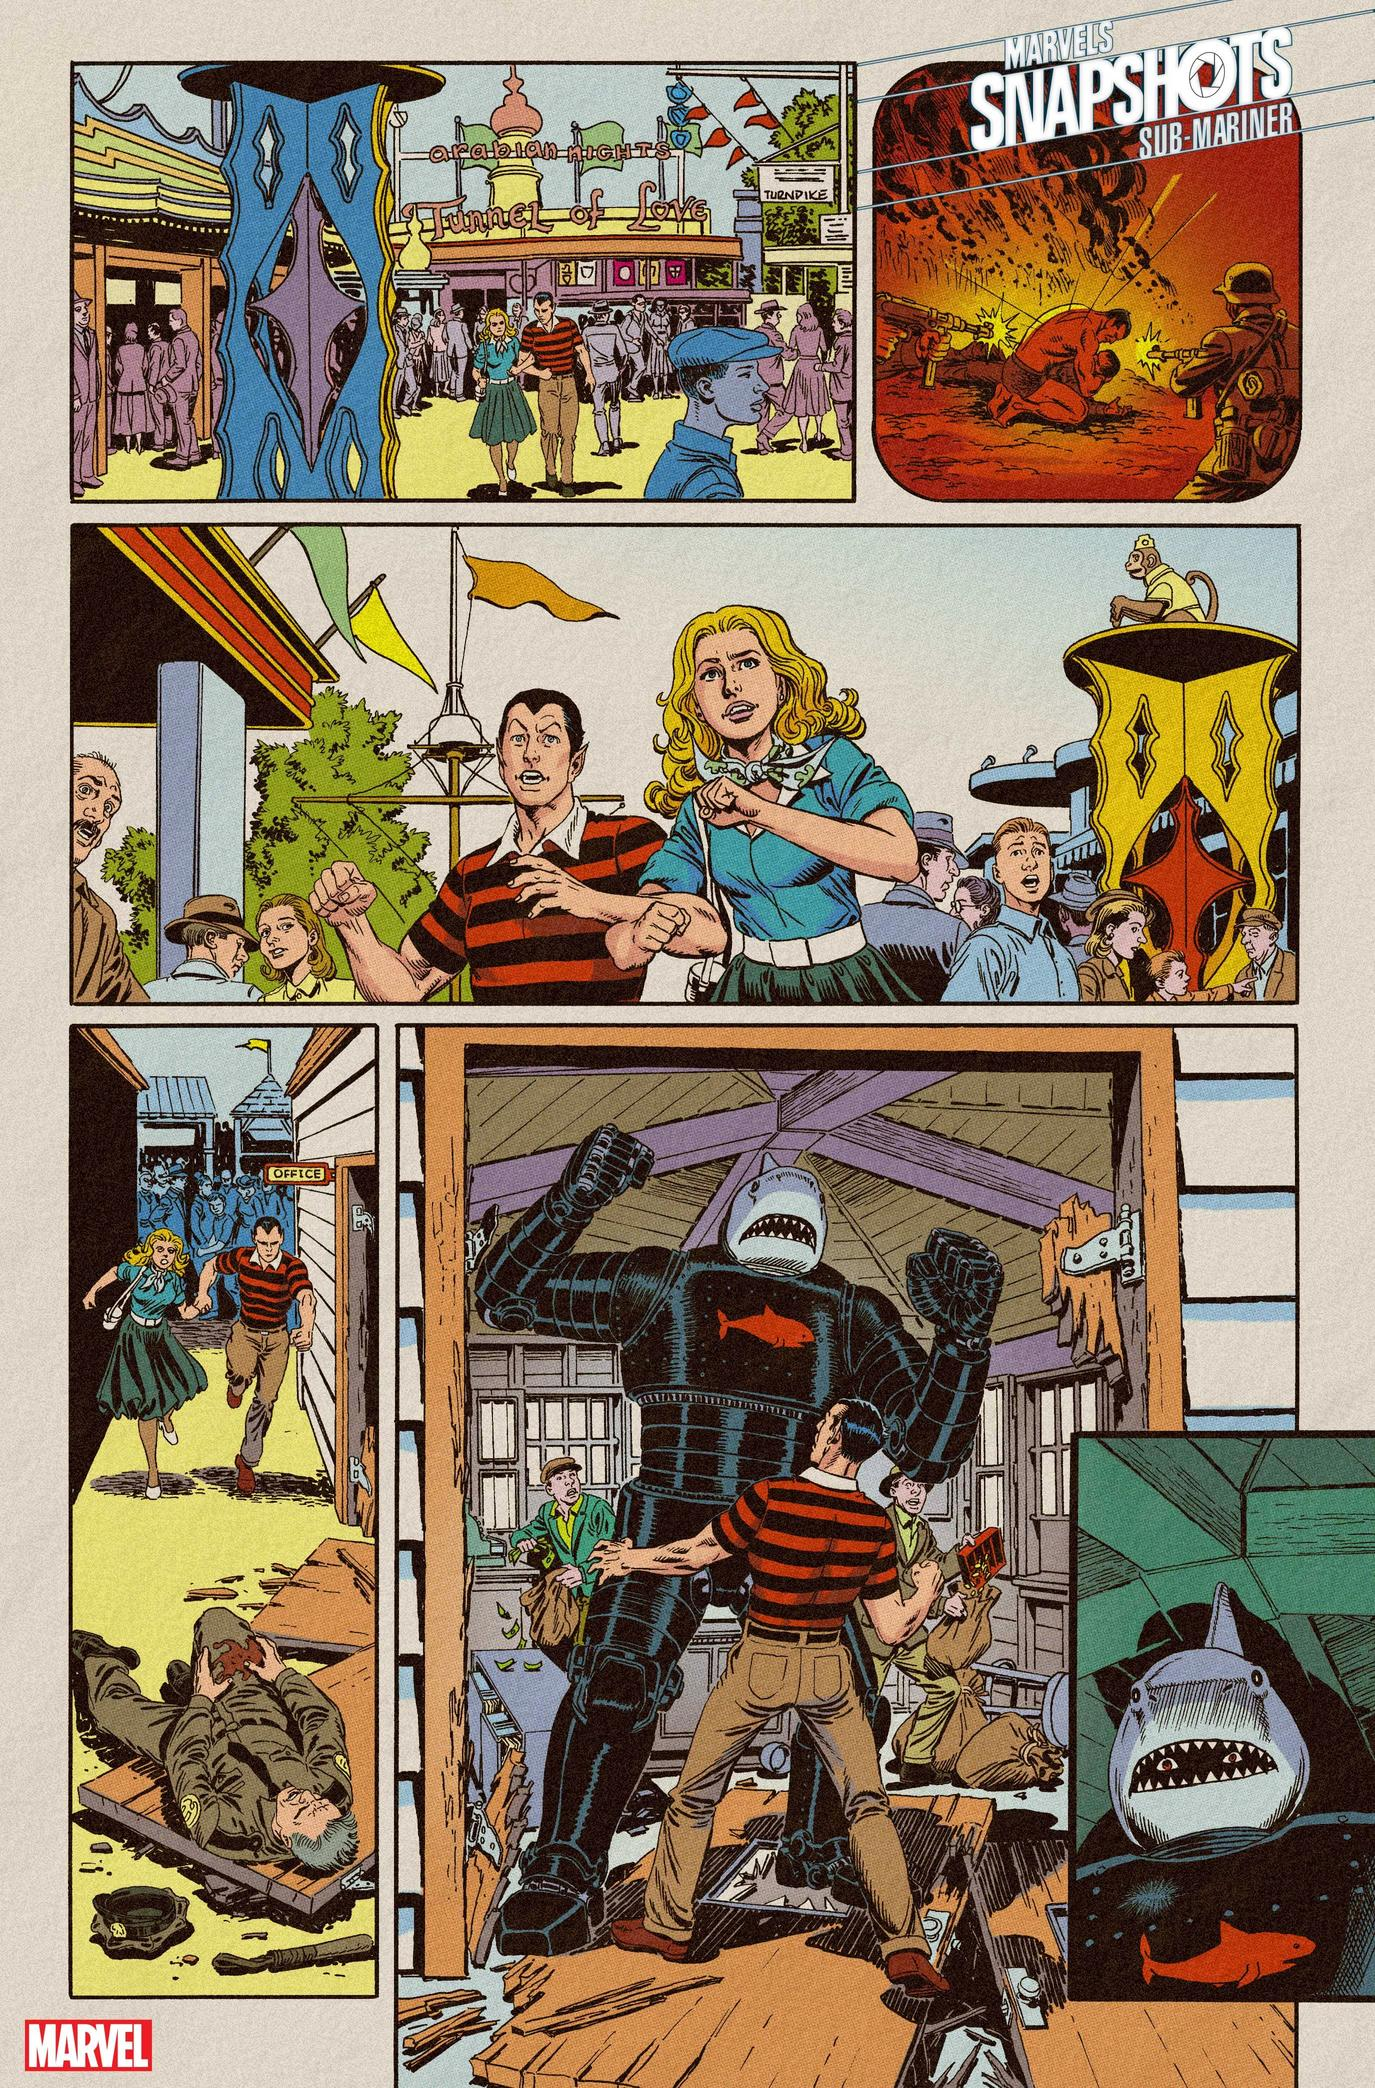 Sub-Mariner: Marvels Snapshot